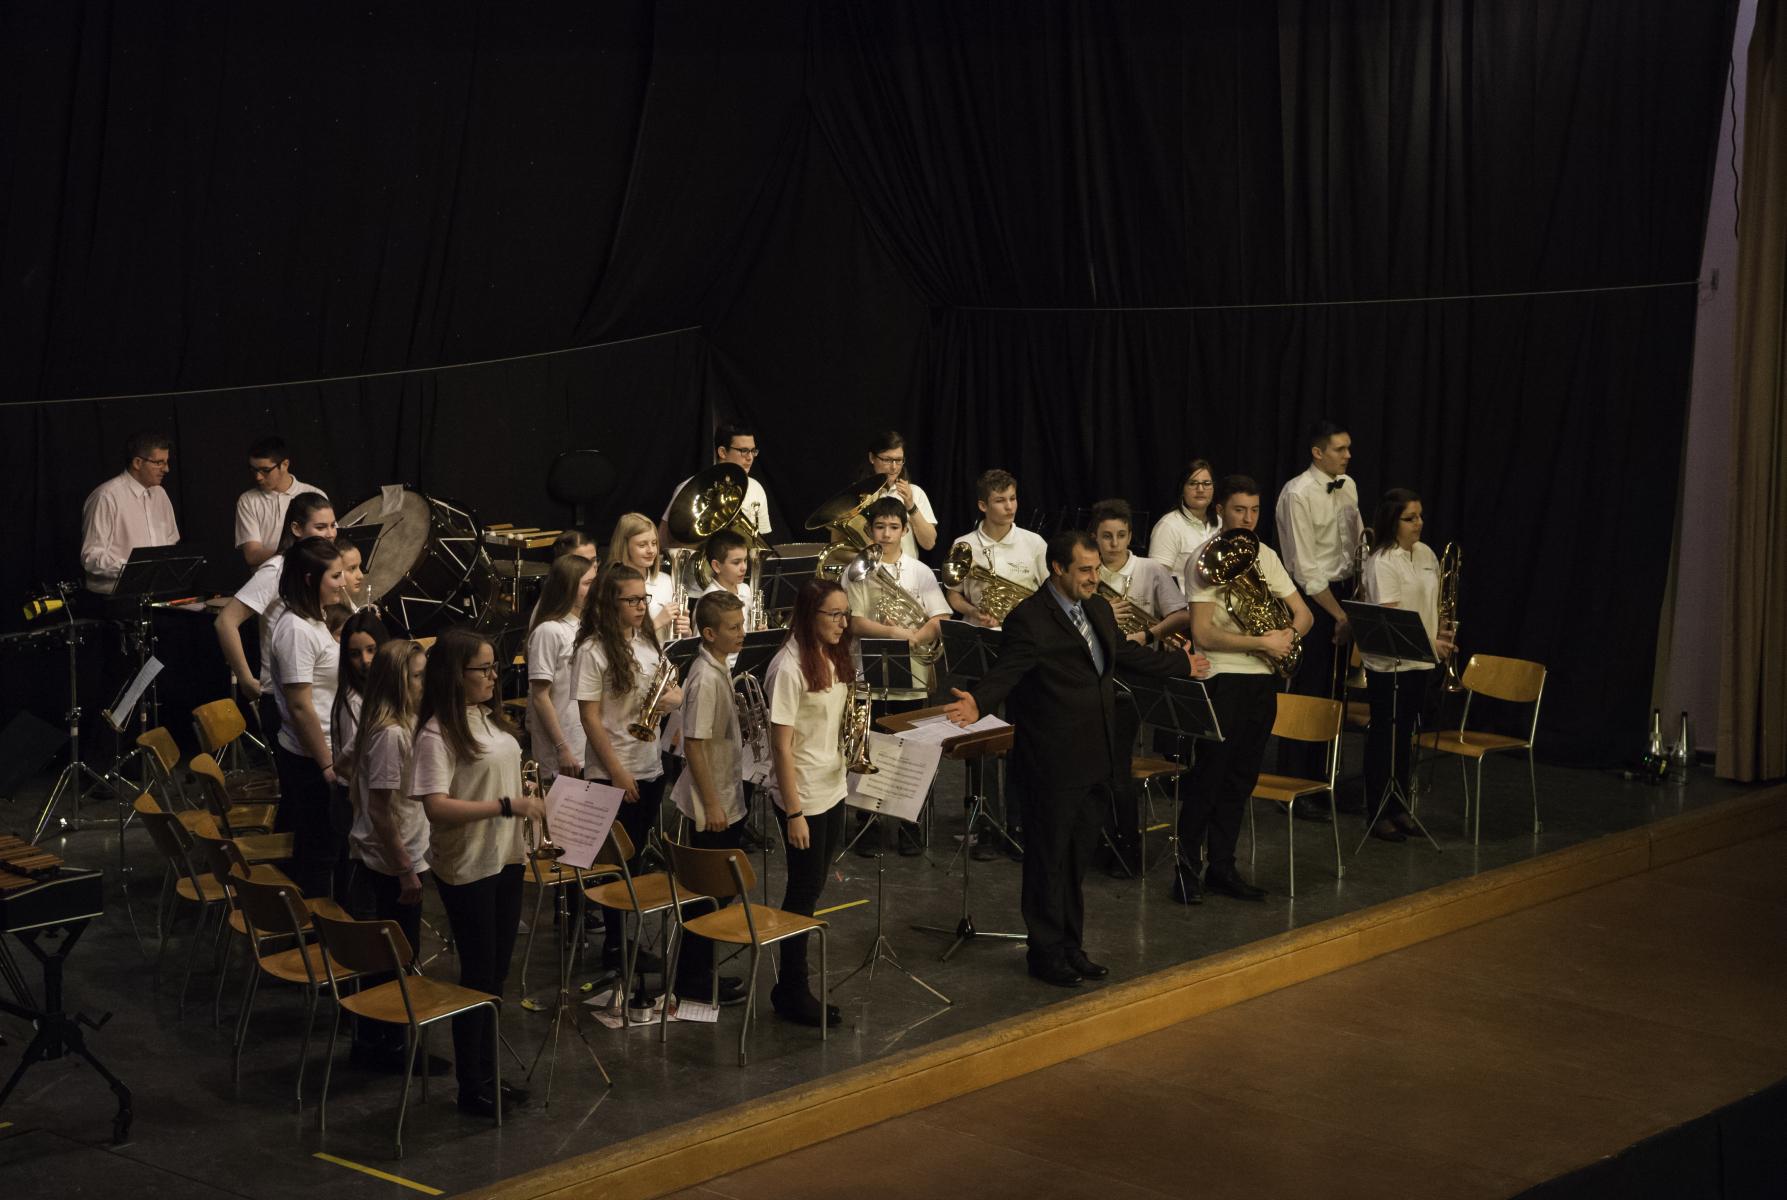 170211_concert_annuel17-031